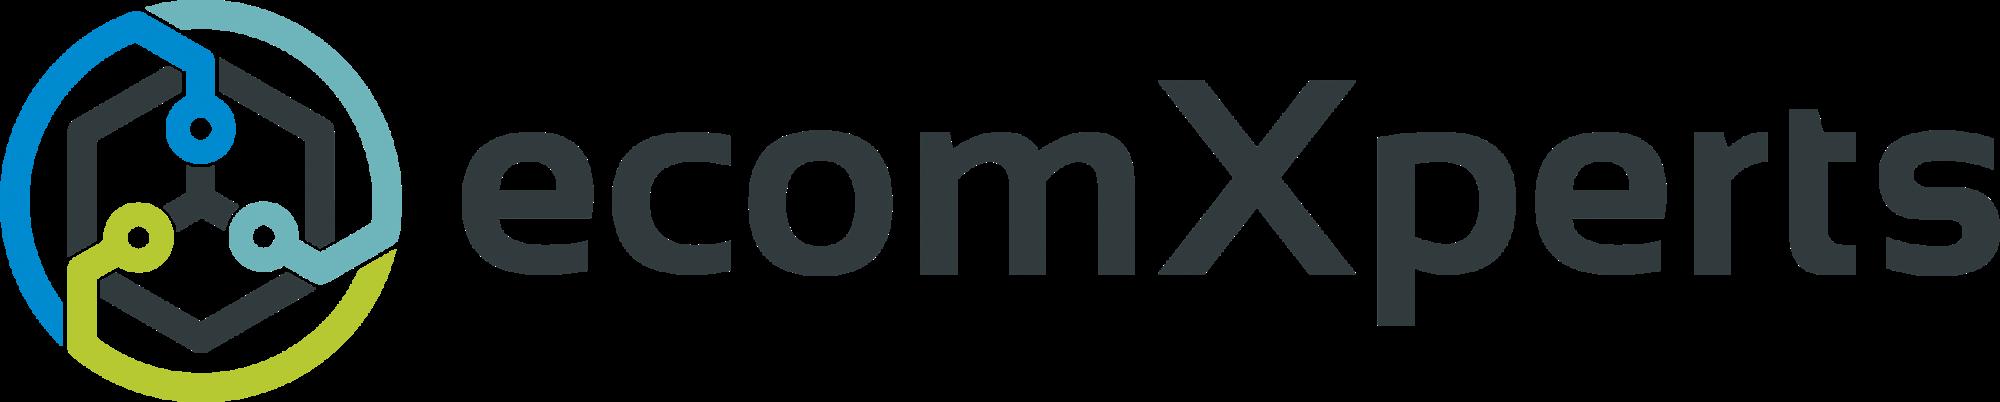 ecomxperts GmbH